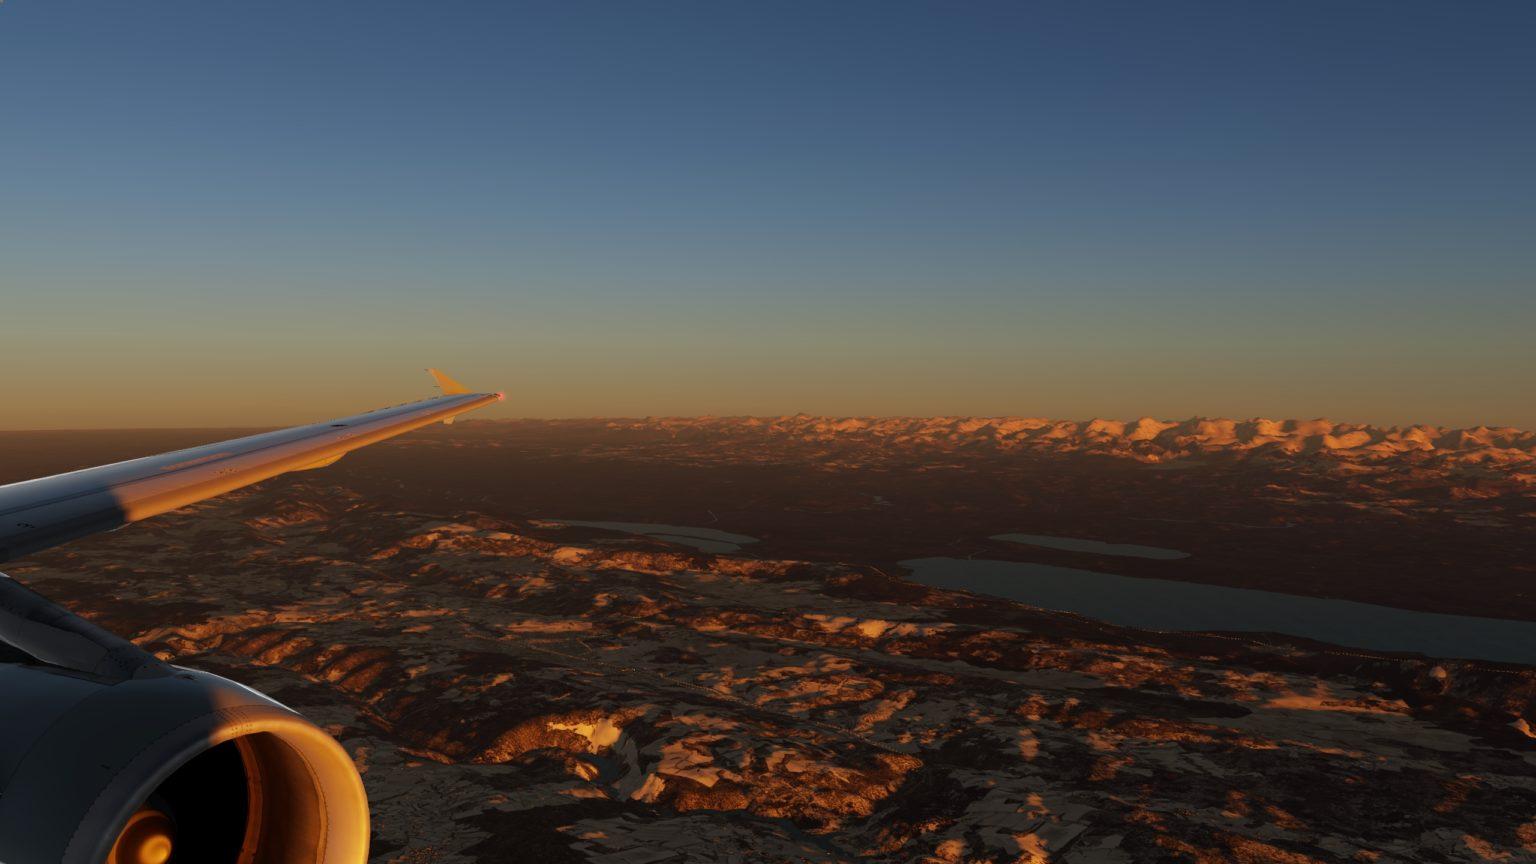 Sonnenuntergang, mit Enhanced Athmospheric